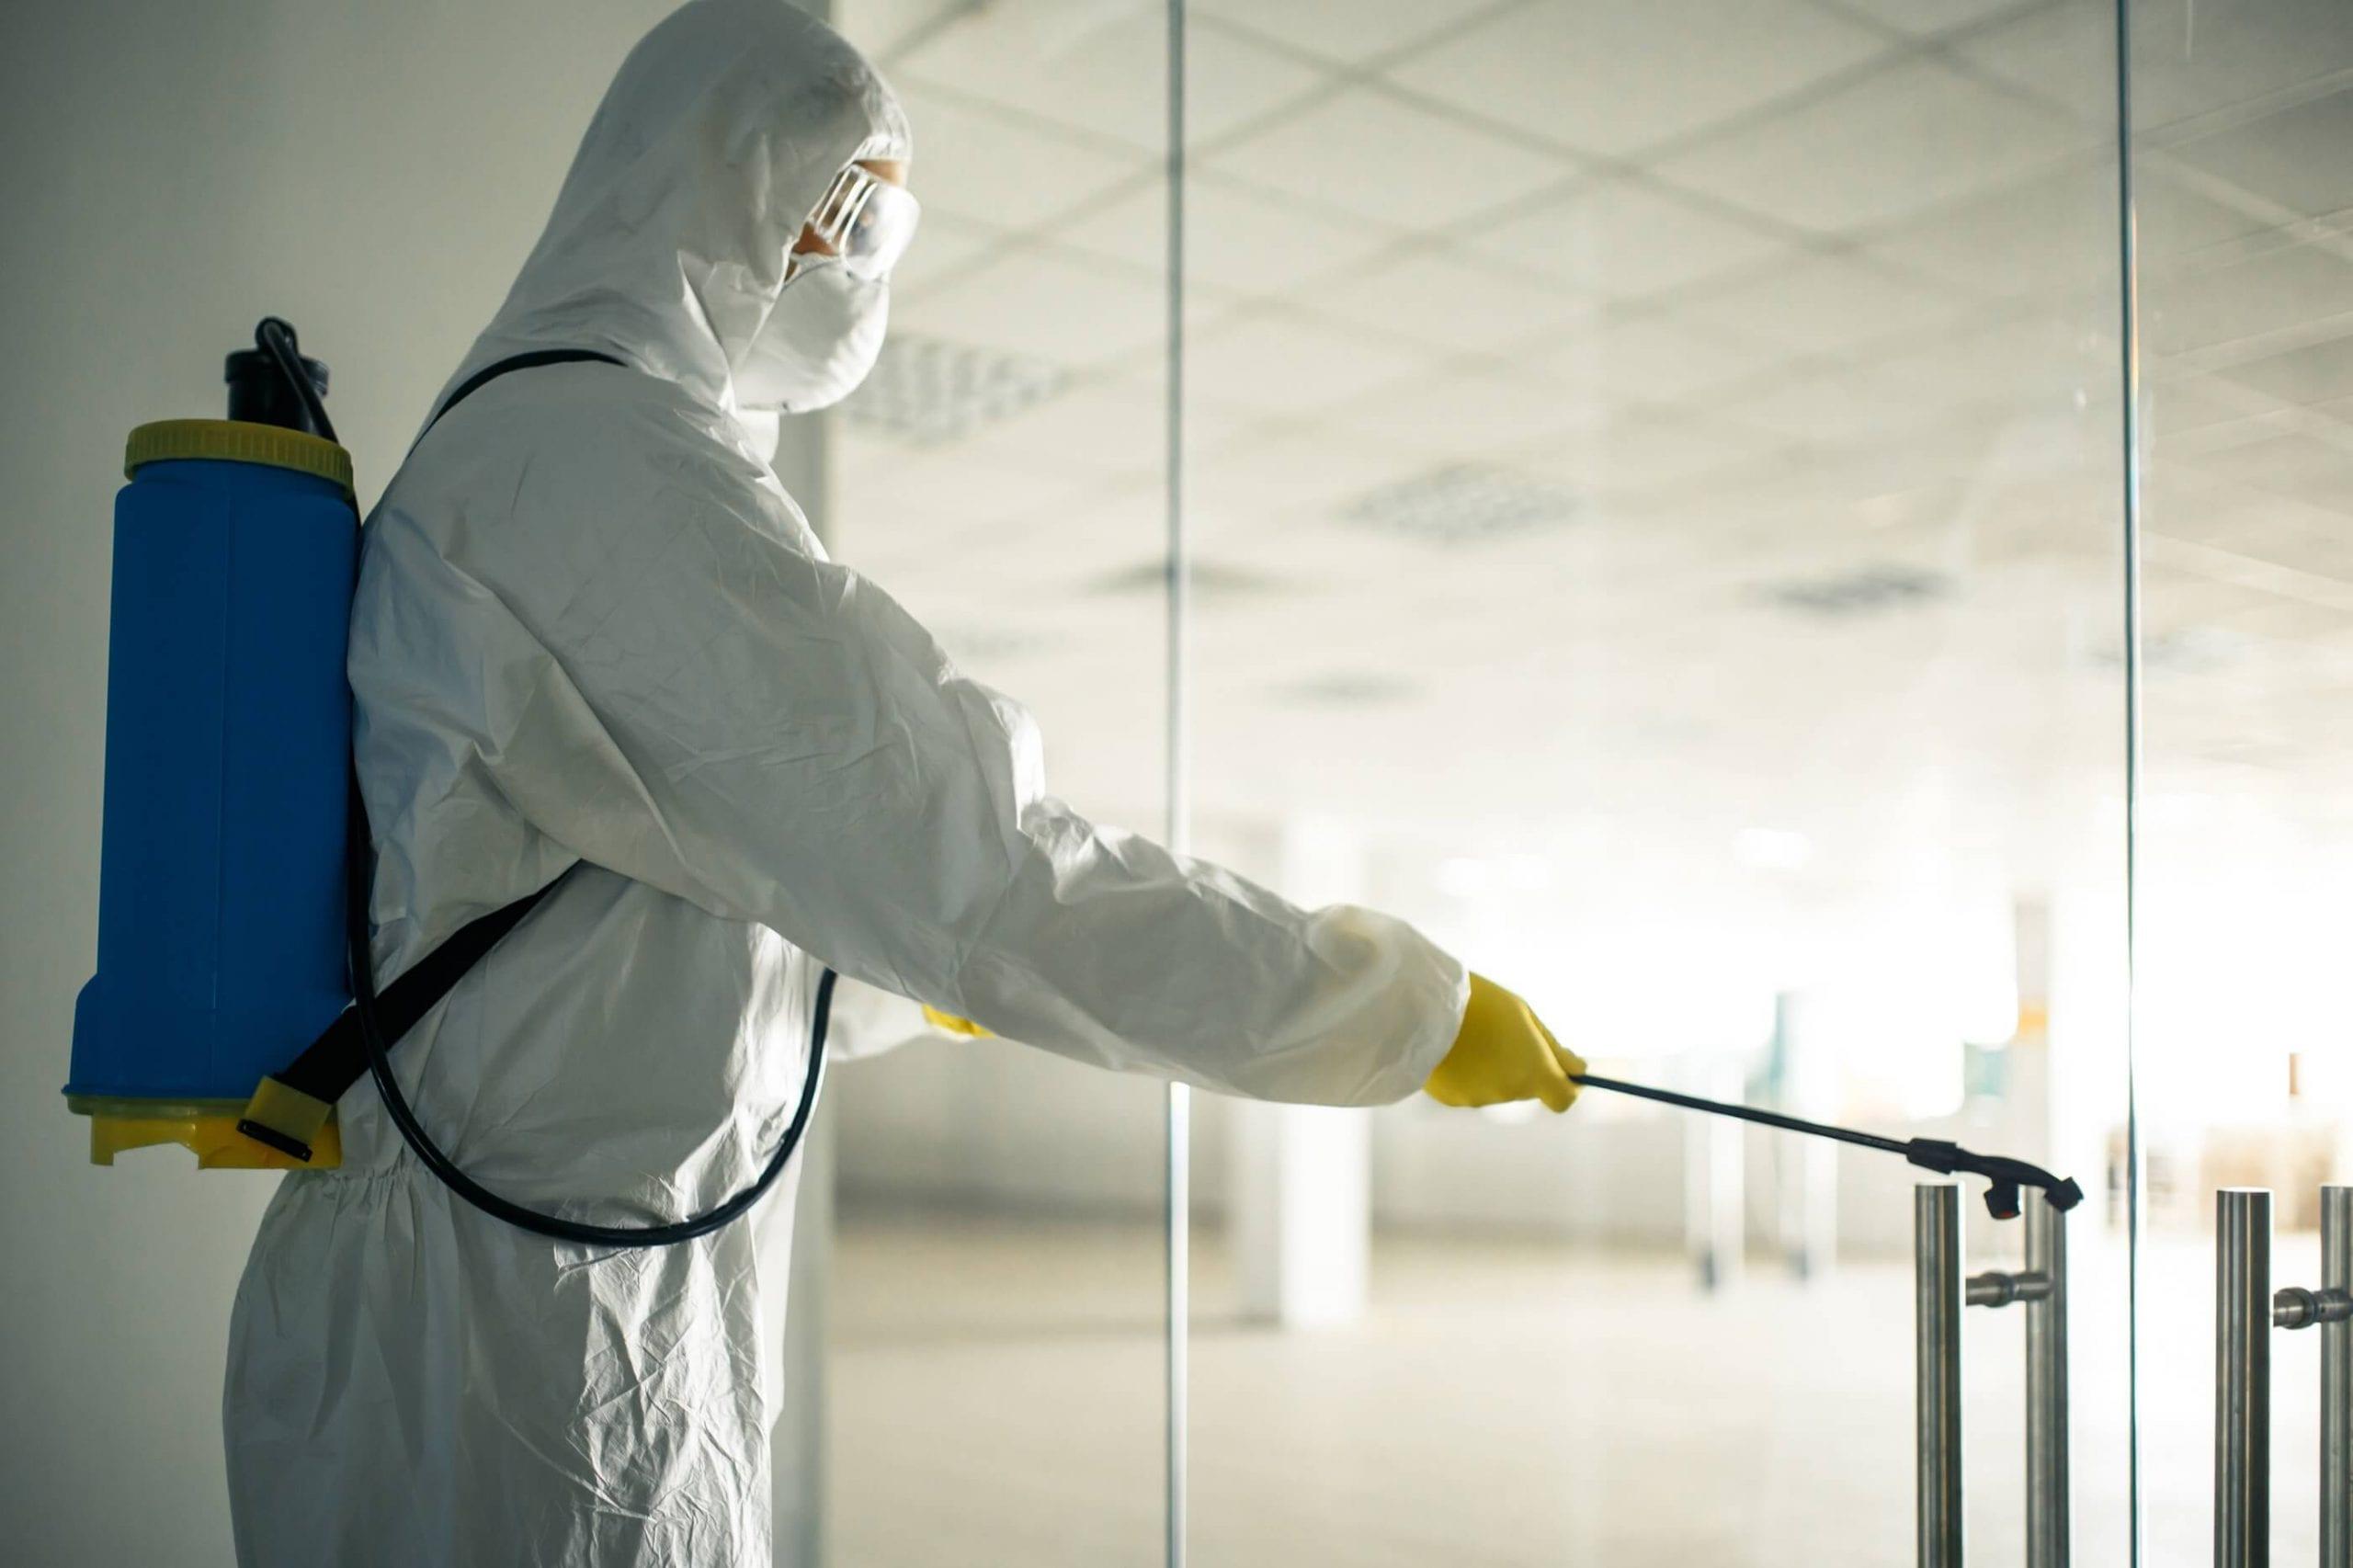 Professional cleaner in sanitation suit spraying sanitation solution on business door